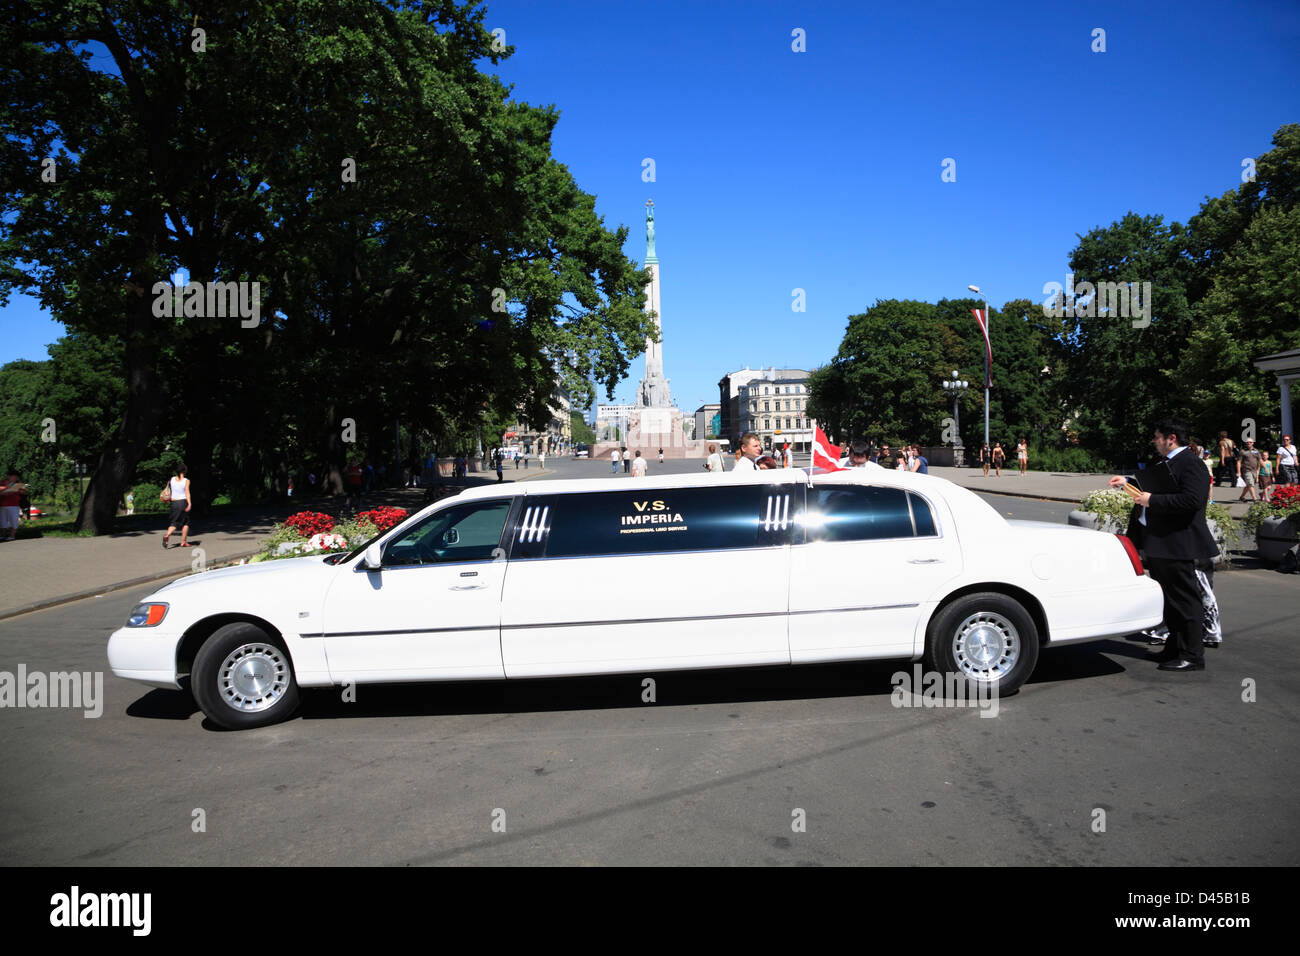 Wedding Limousine, Stretchlimousine in Riga, Latvia - Stock Image